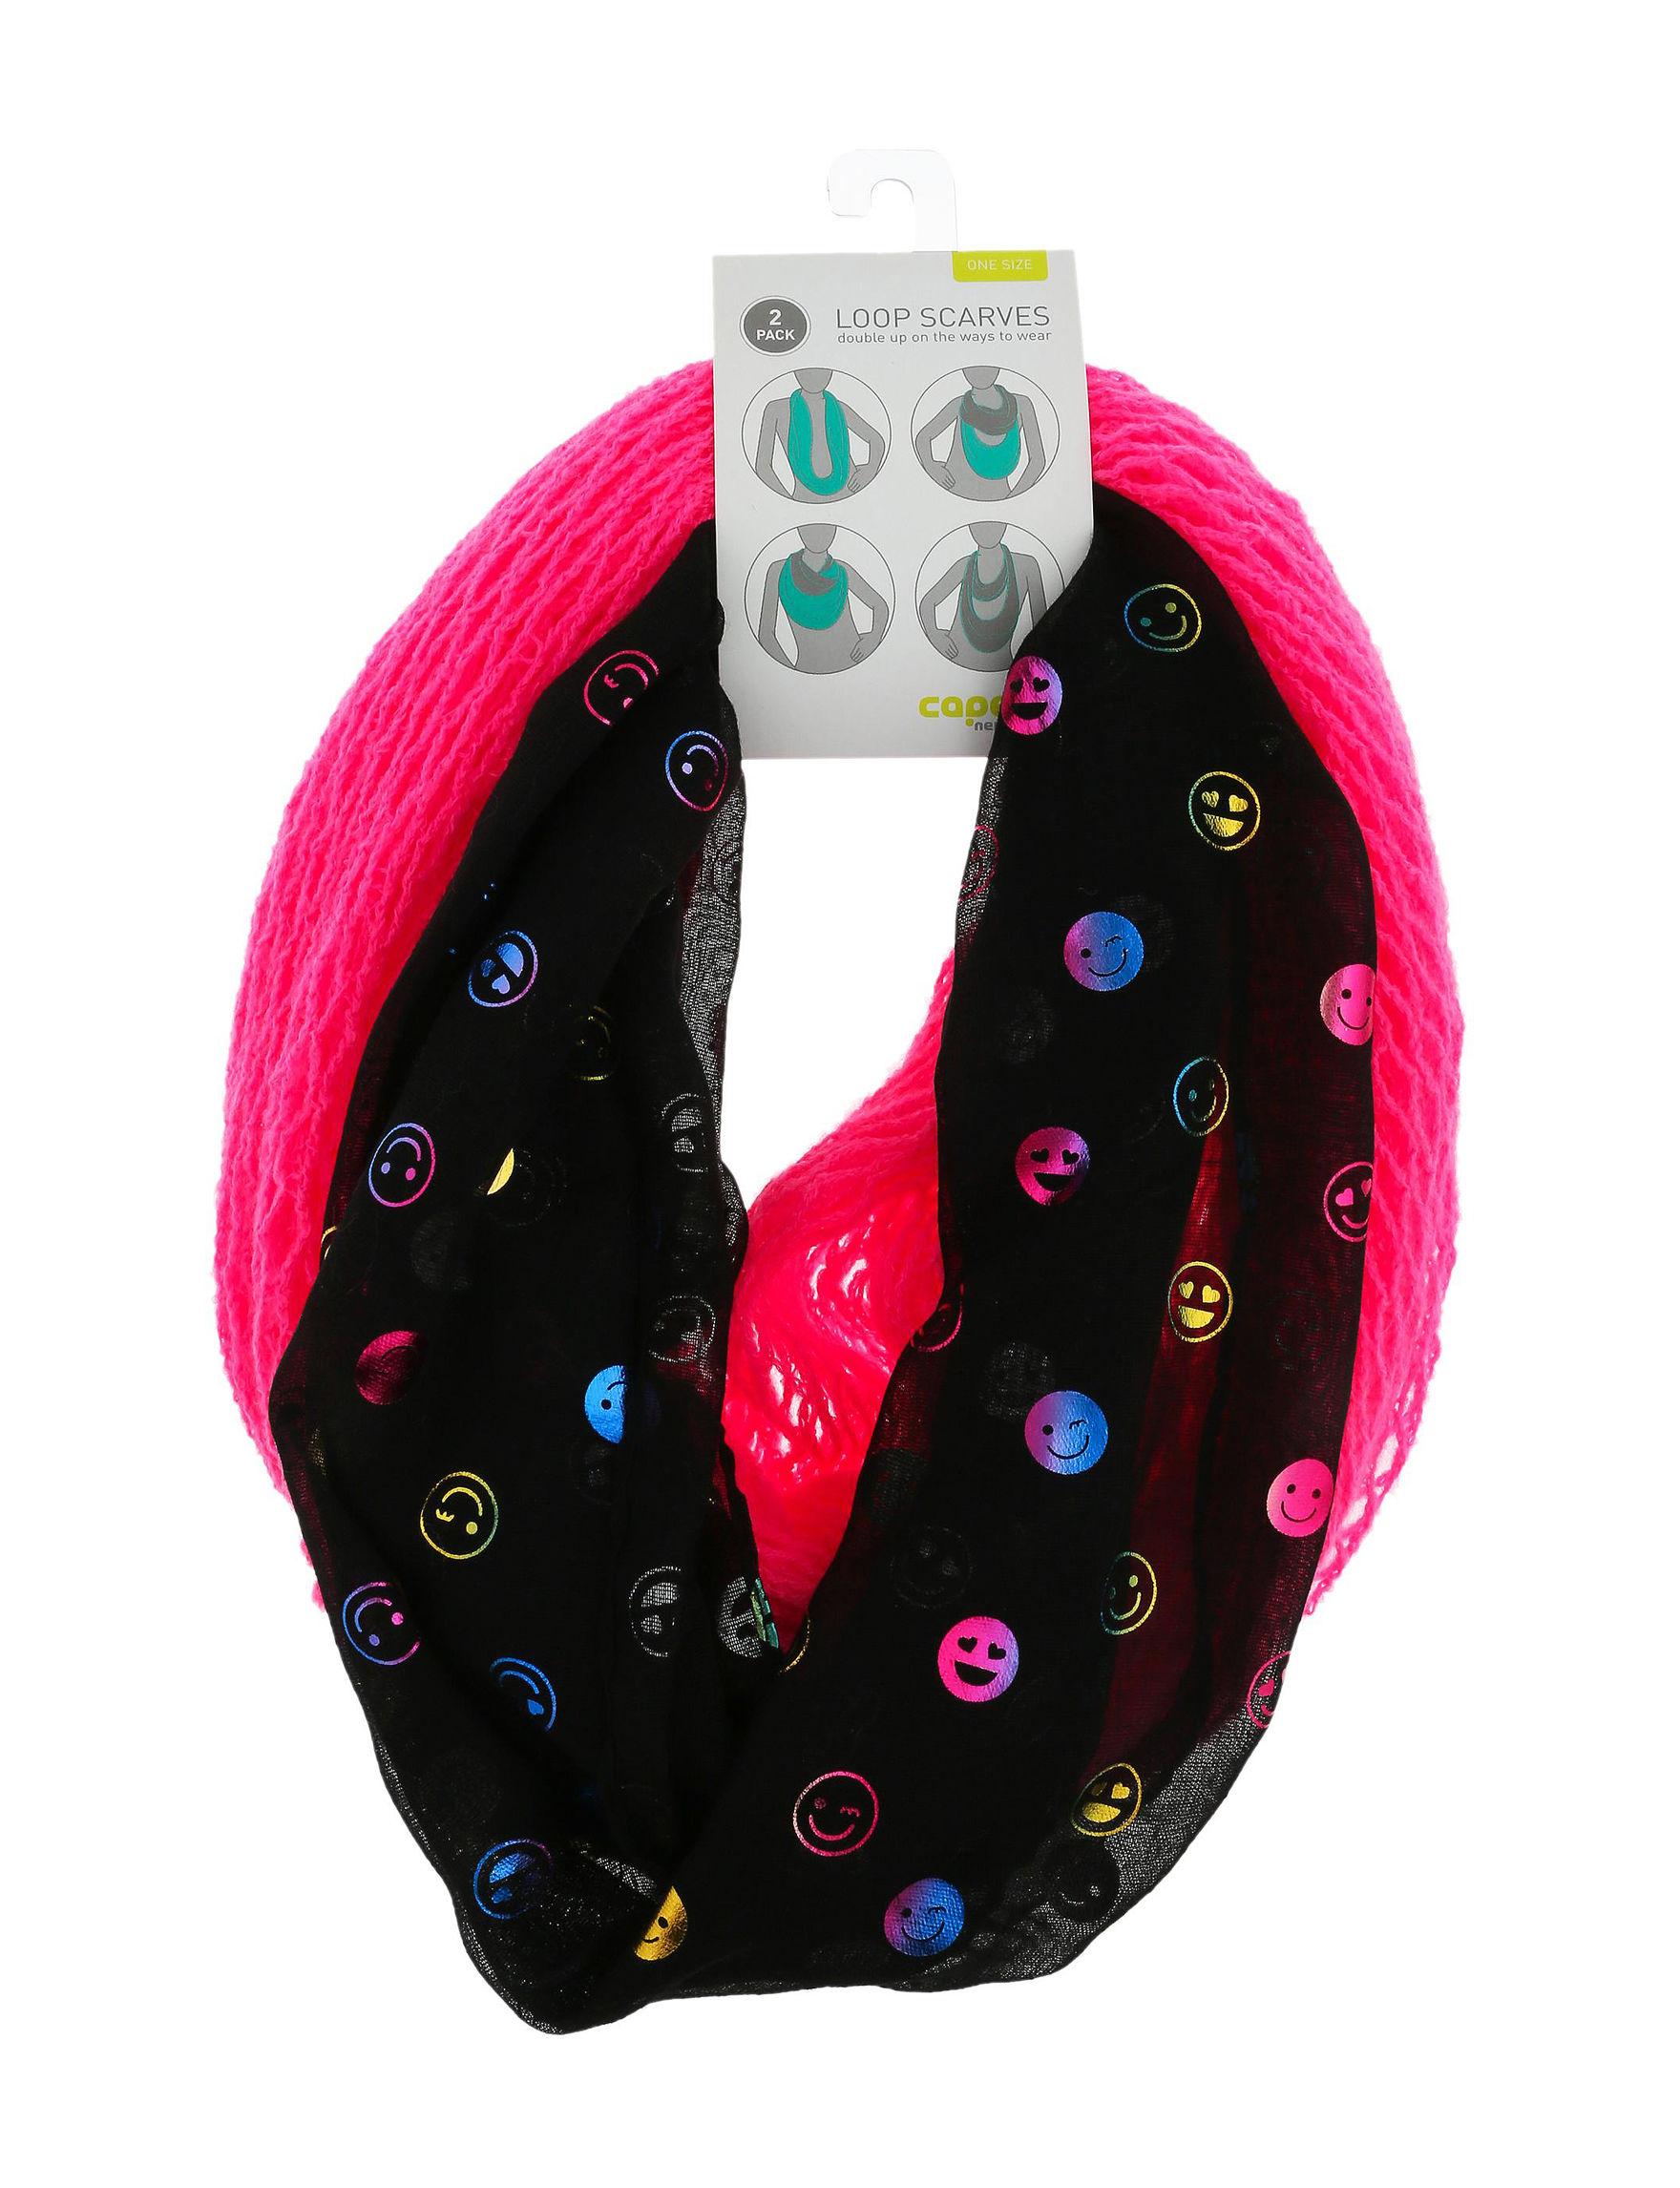 Capelli Pink / Black Hats, Gloves & Scarves